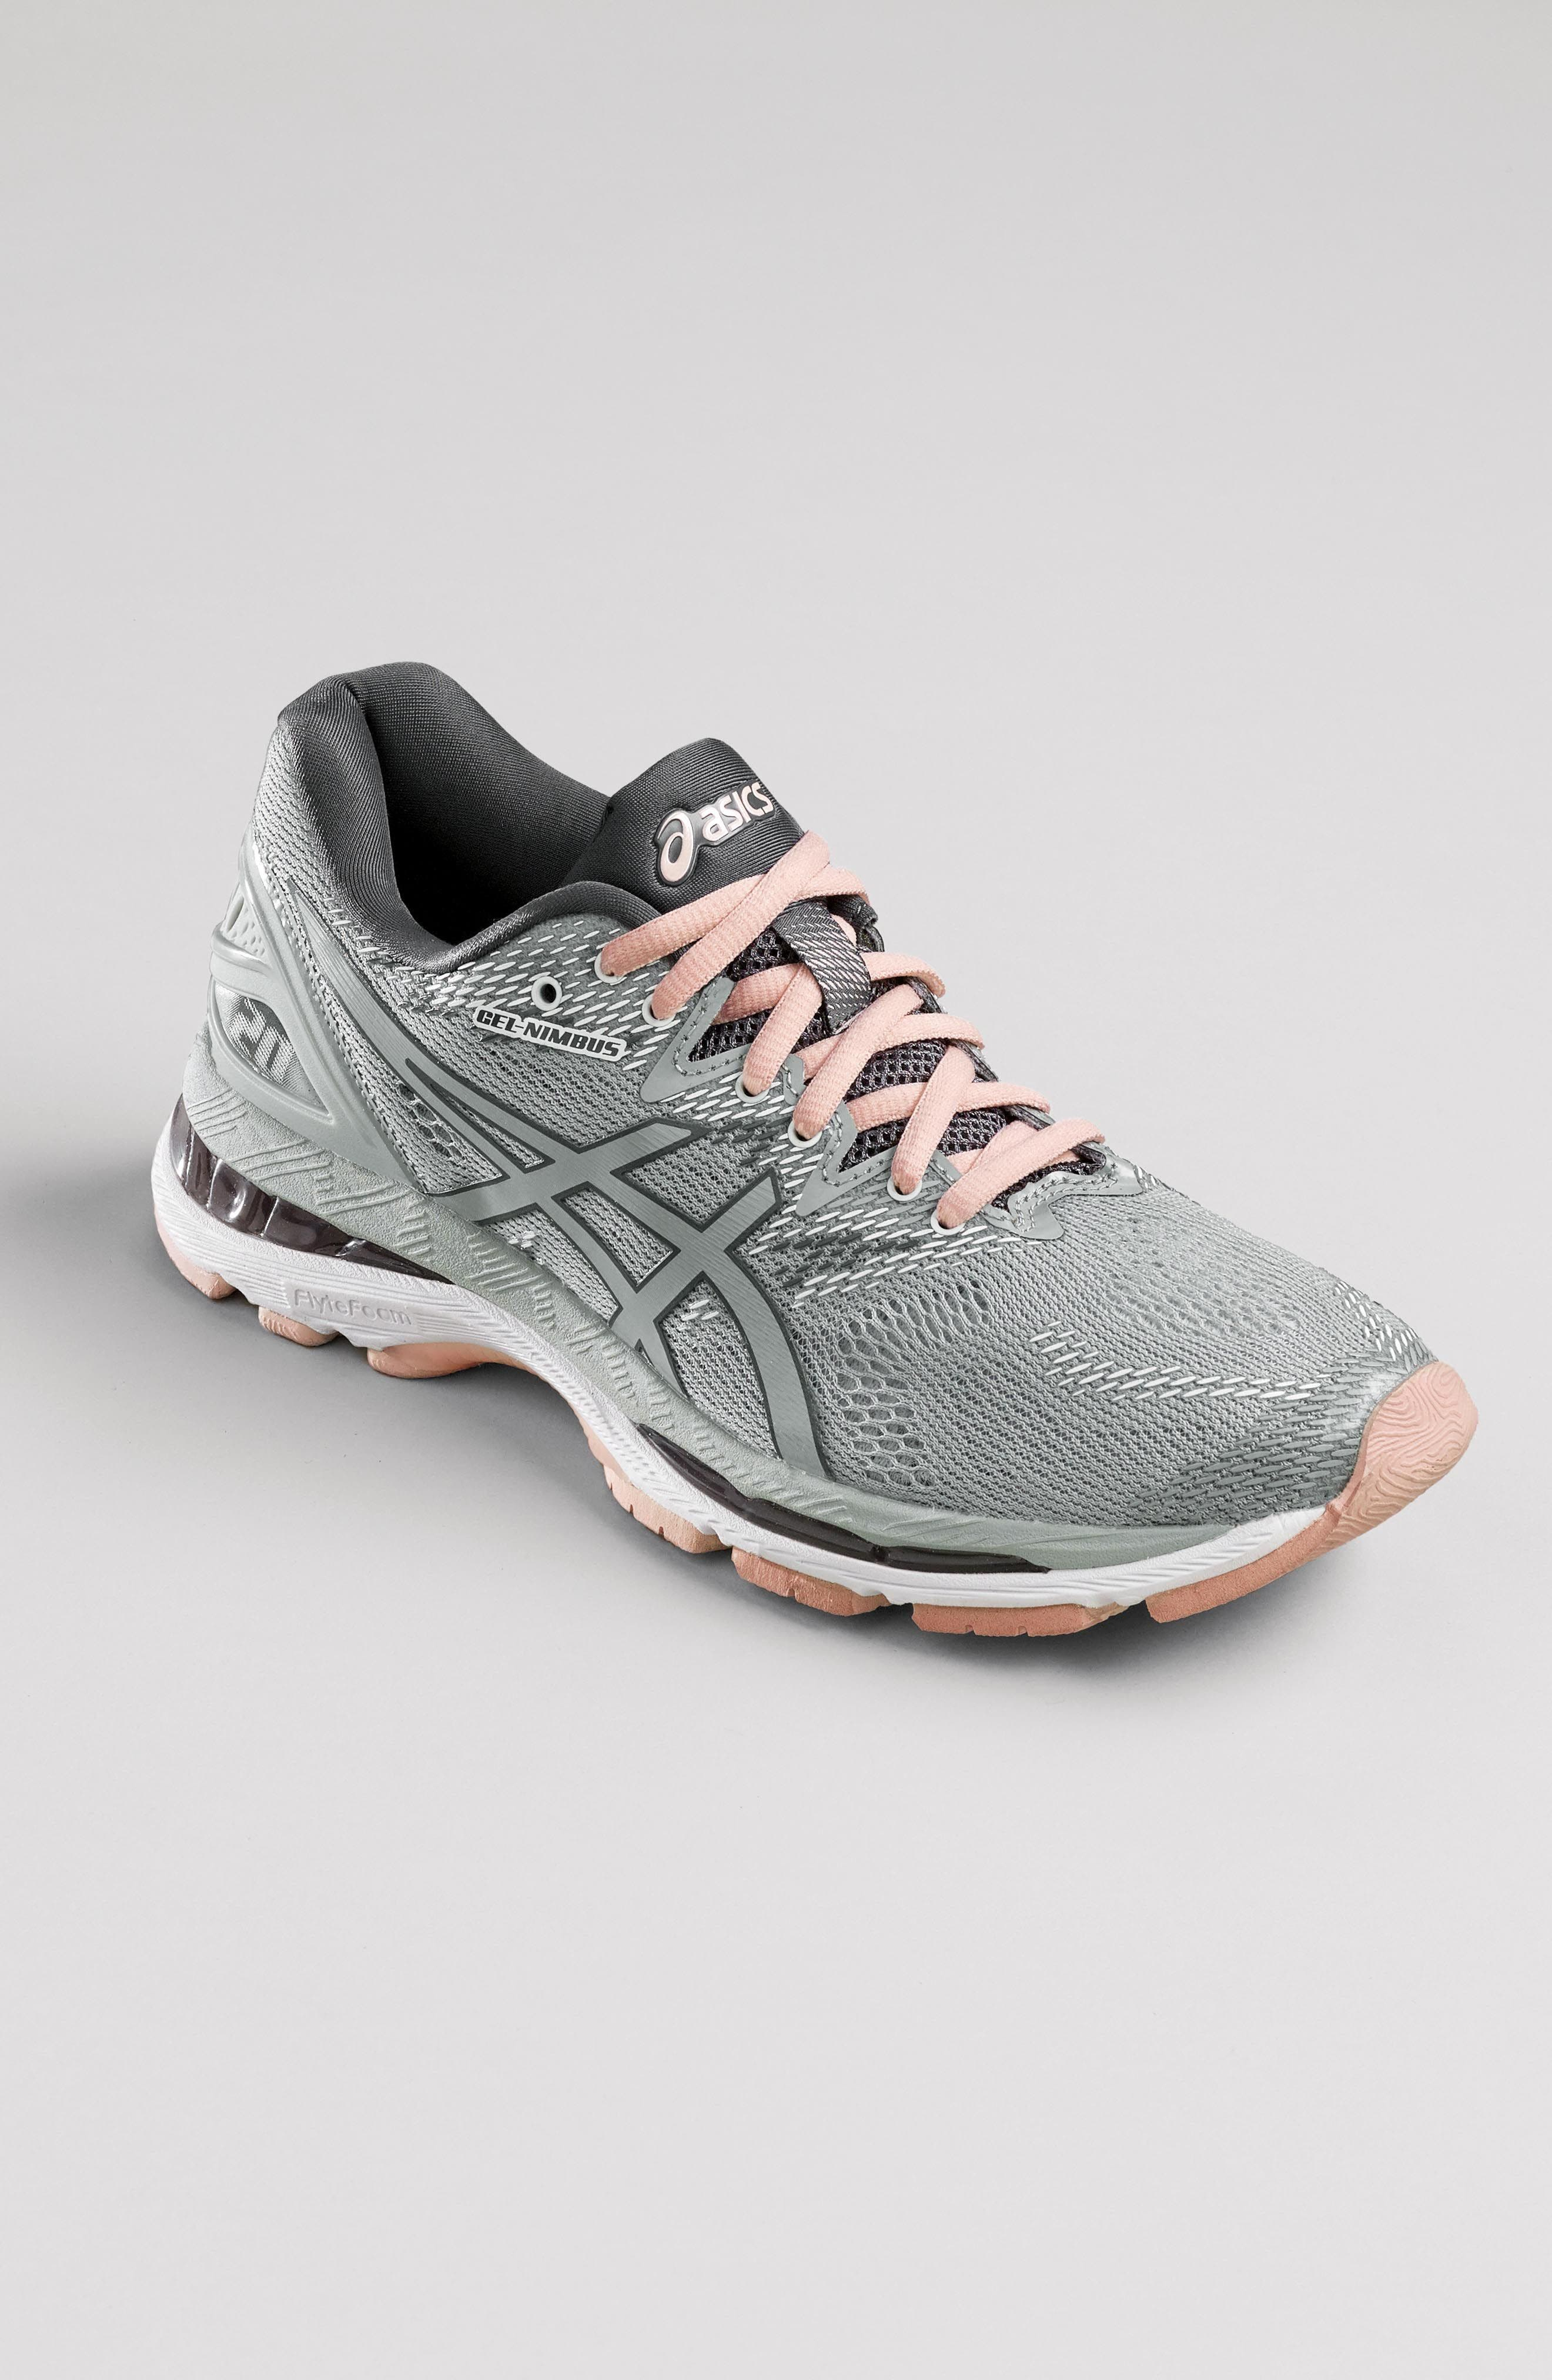 GEL<sup>®</sup>-Nimbus 20 Running Shoe,                             Alternate thumbnail 7, color,                             MID GREY/ SEASHELL PINK